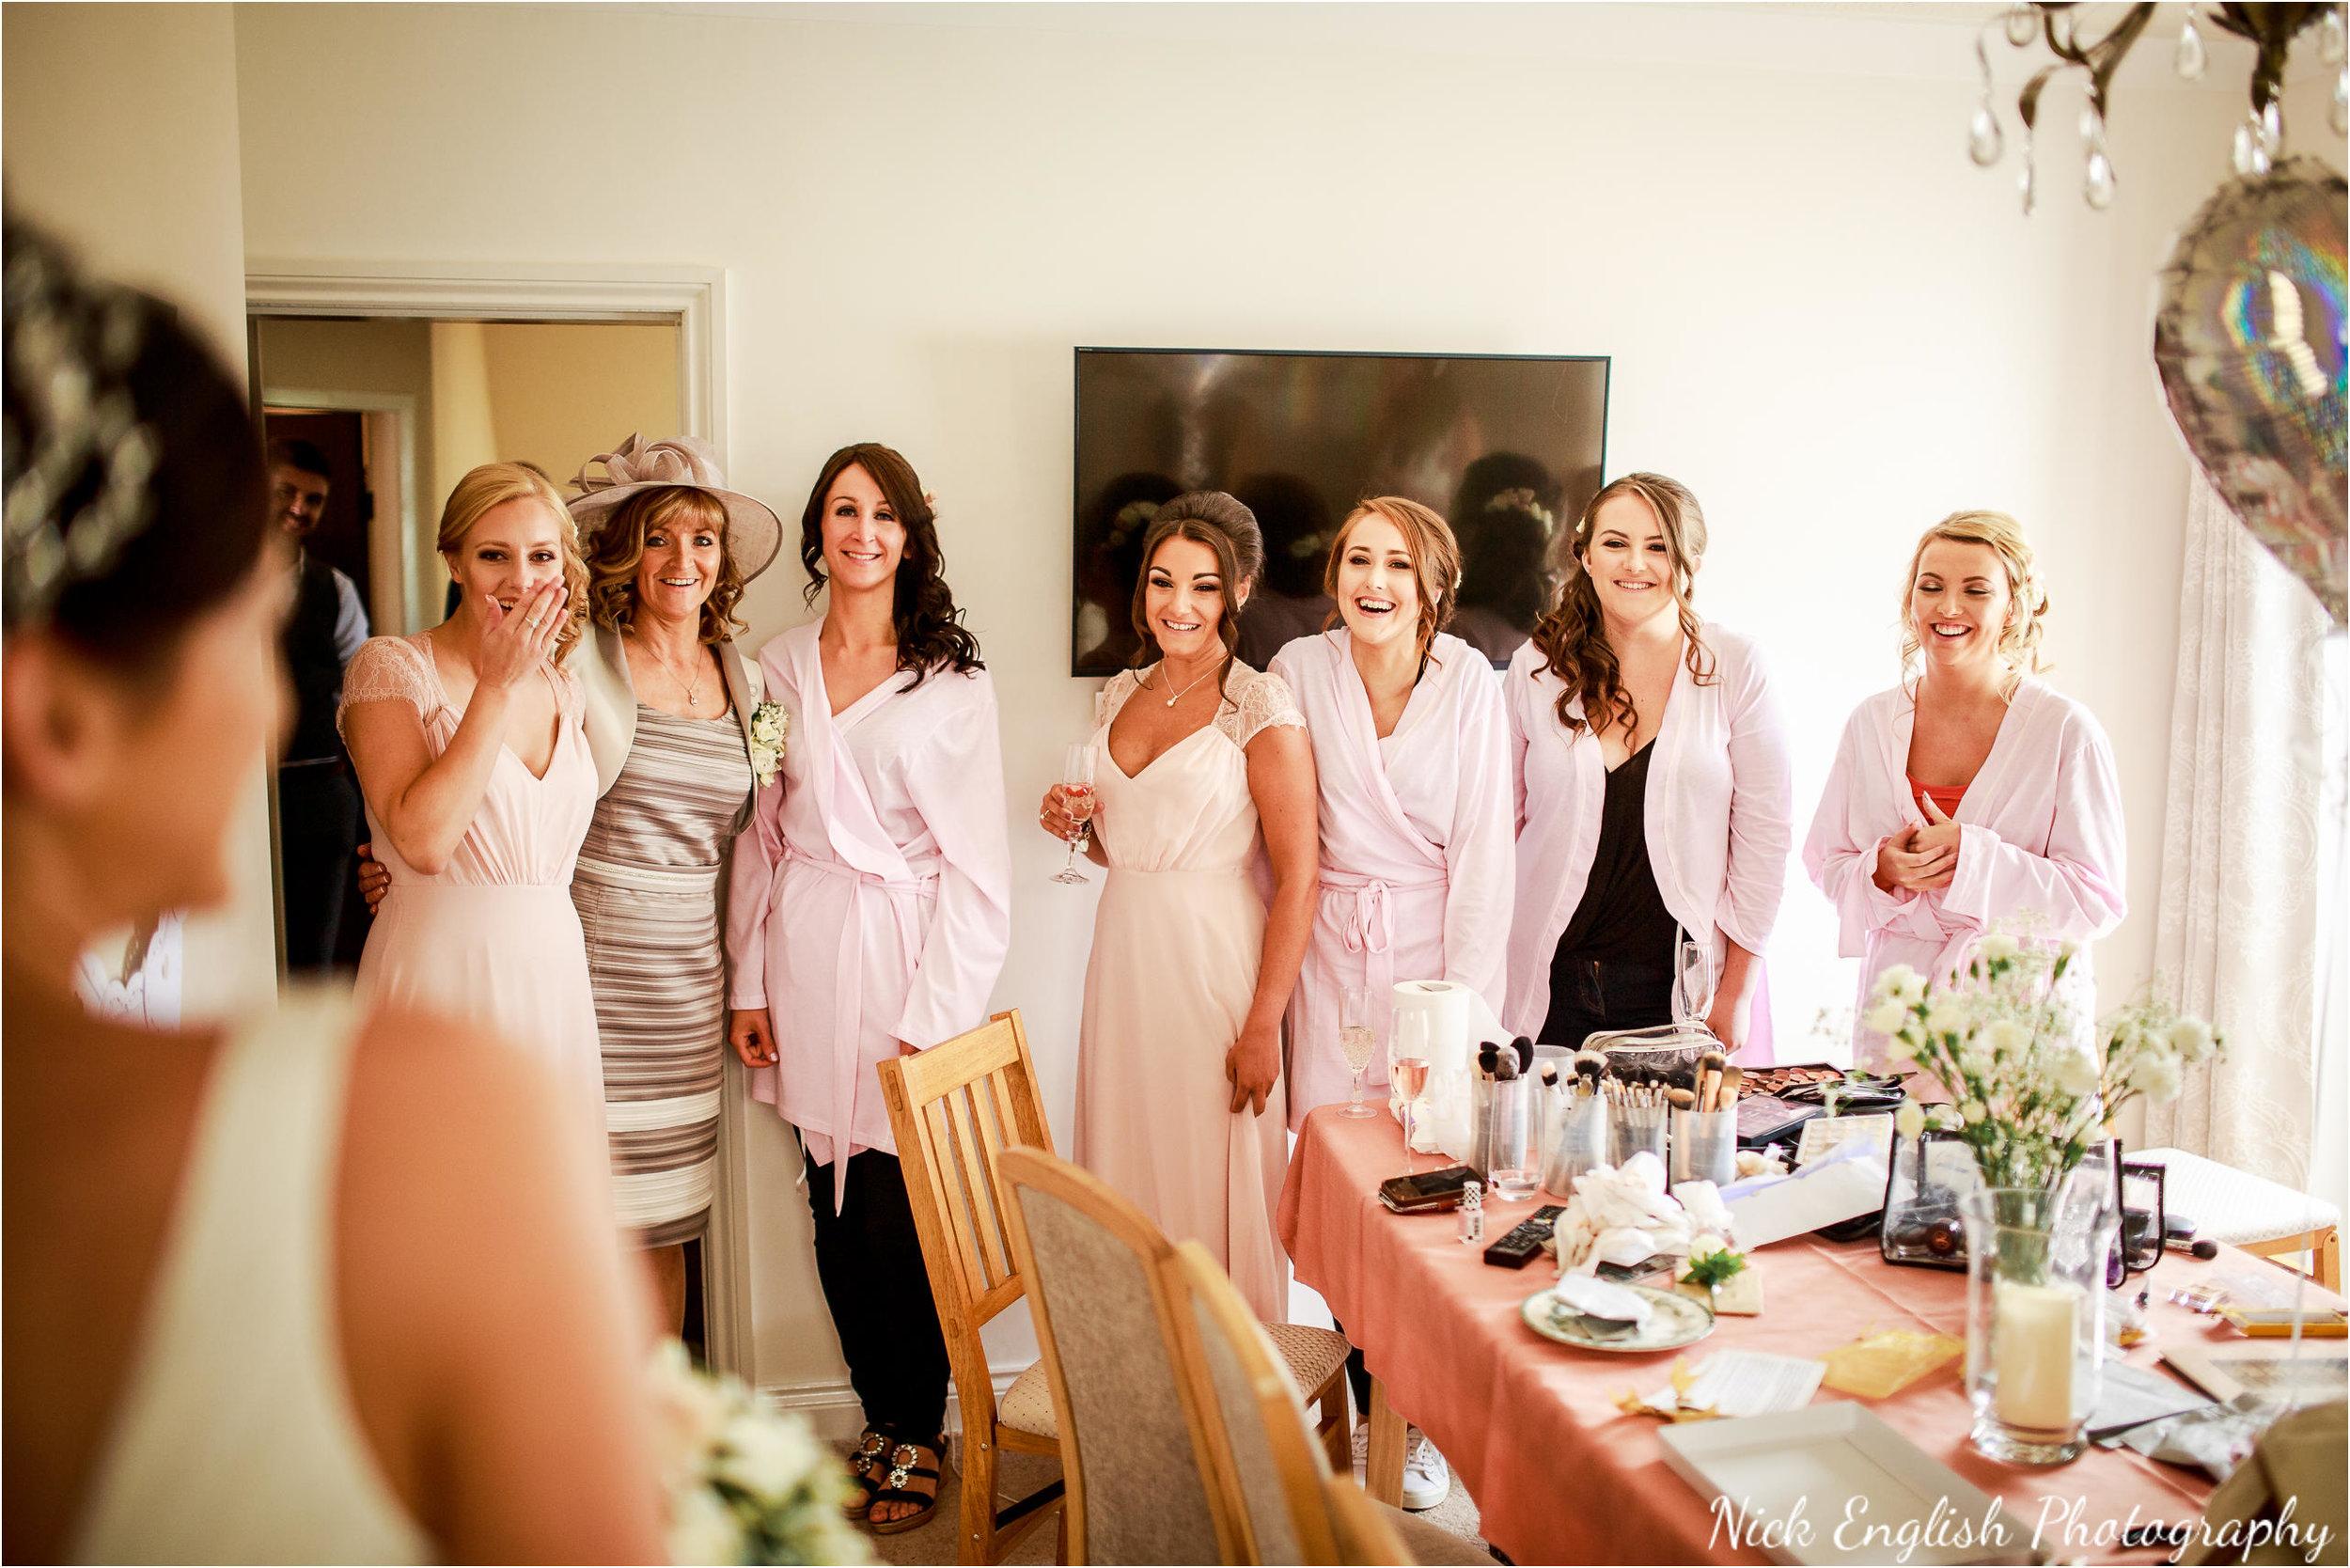 Emily David Wedding Photographs at Barton Grange Preston by Nick English Photography 40jpg.jpeg